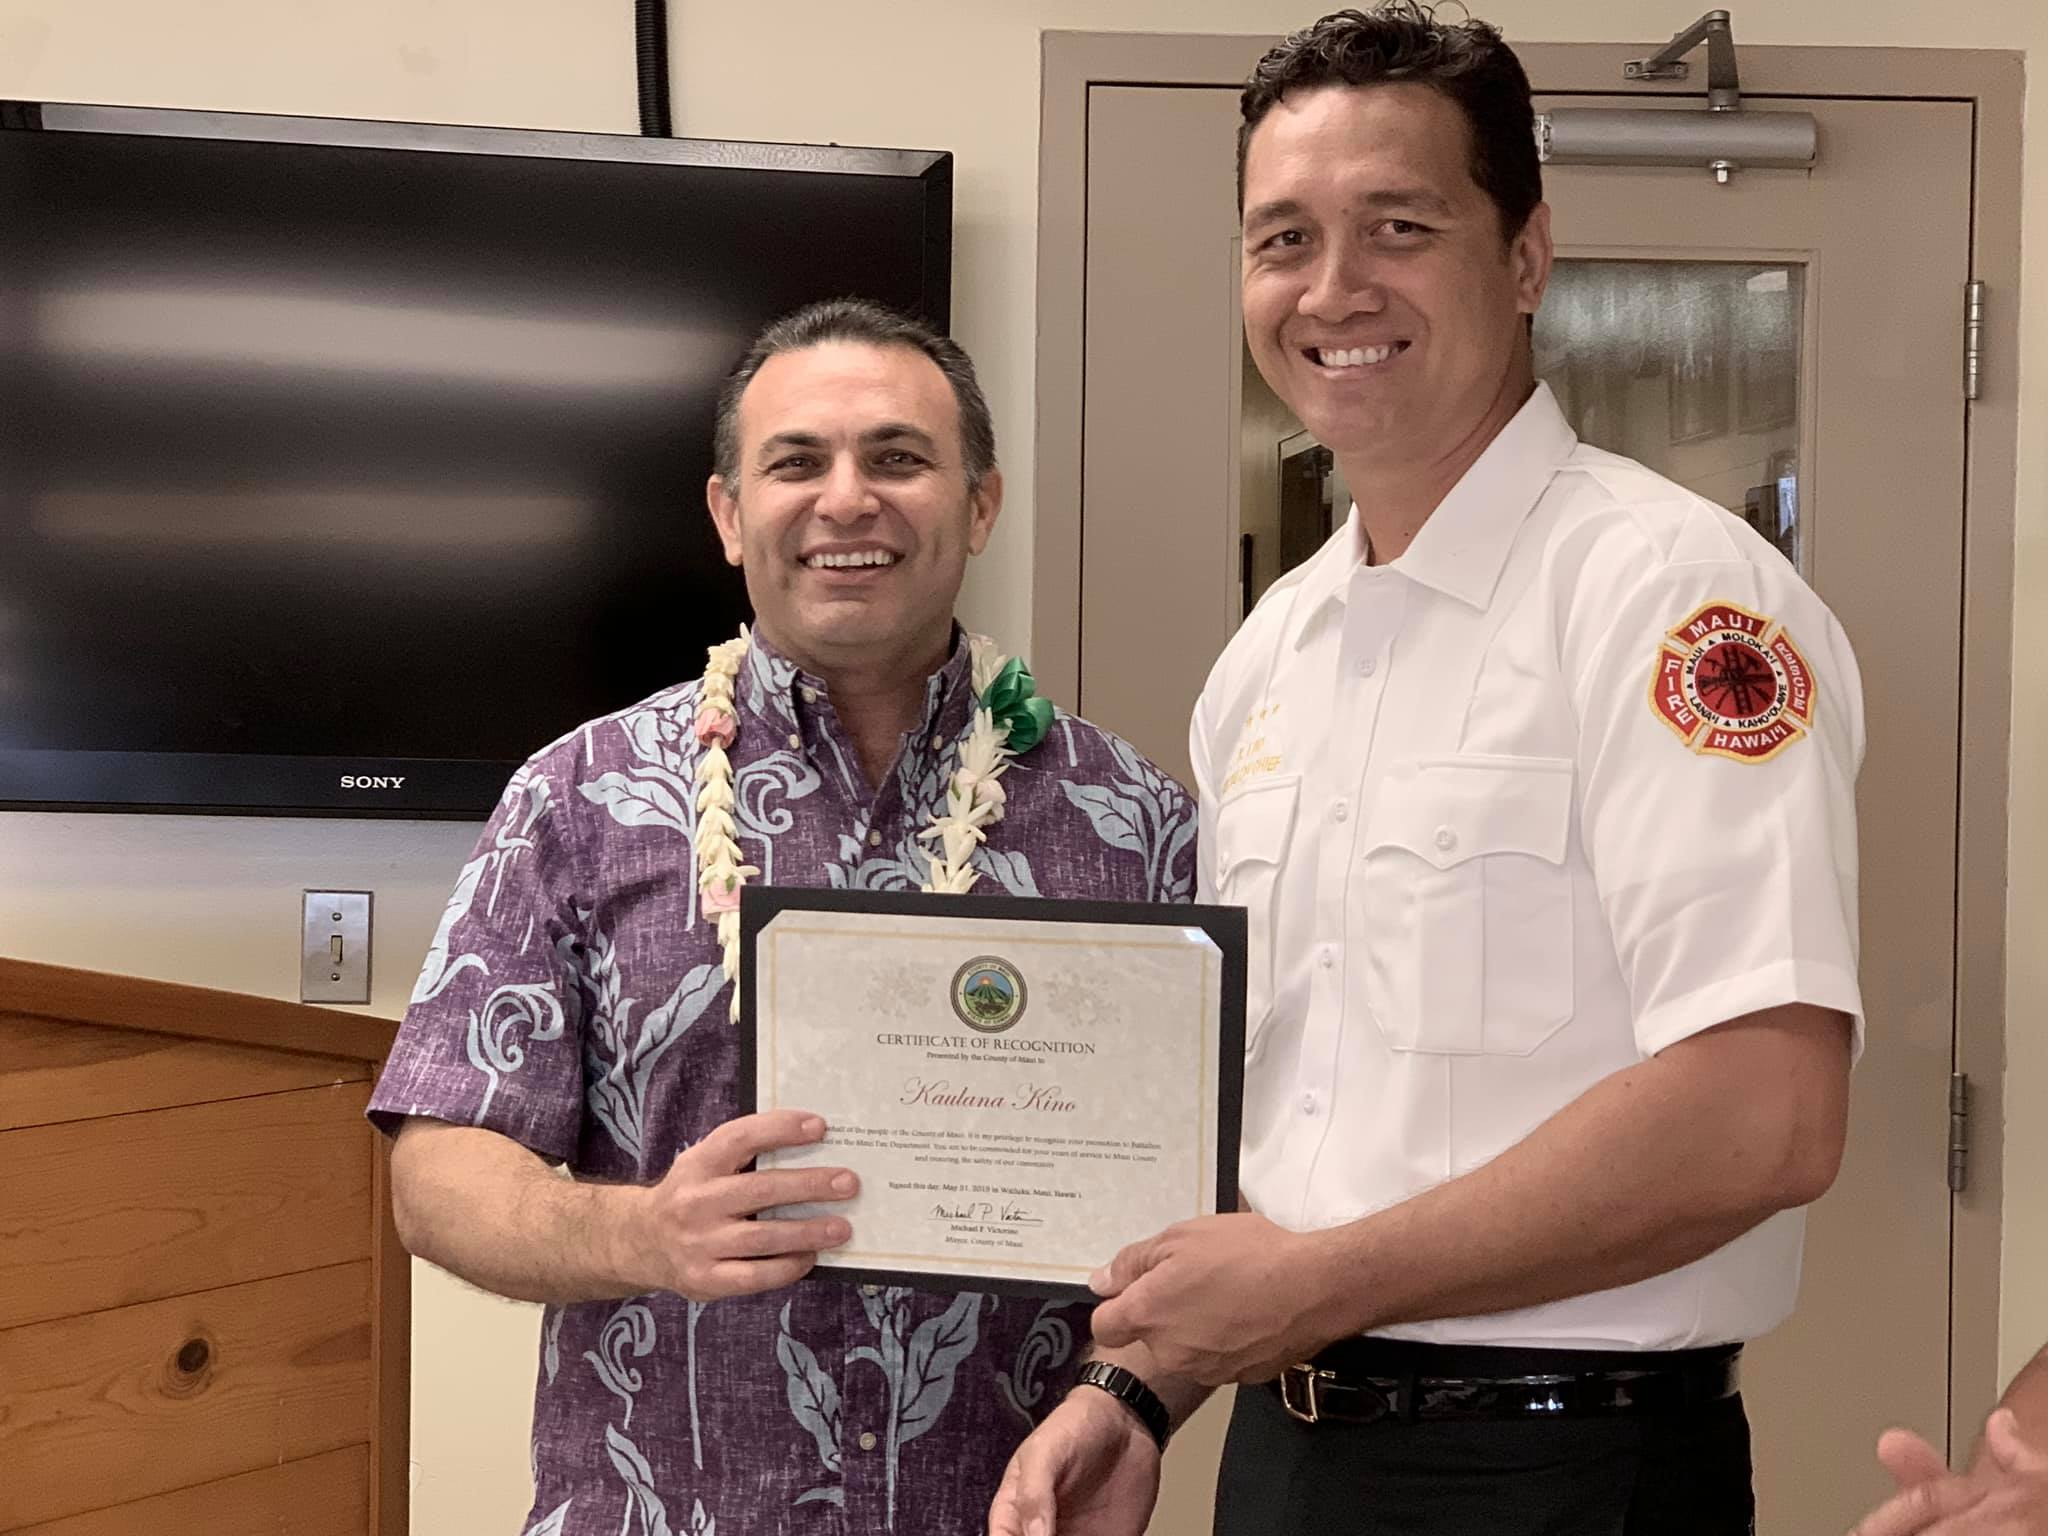 Maui Fire Dept Promotes Kino to Battalion Chief